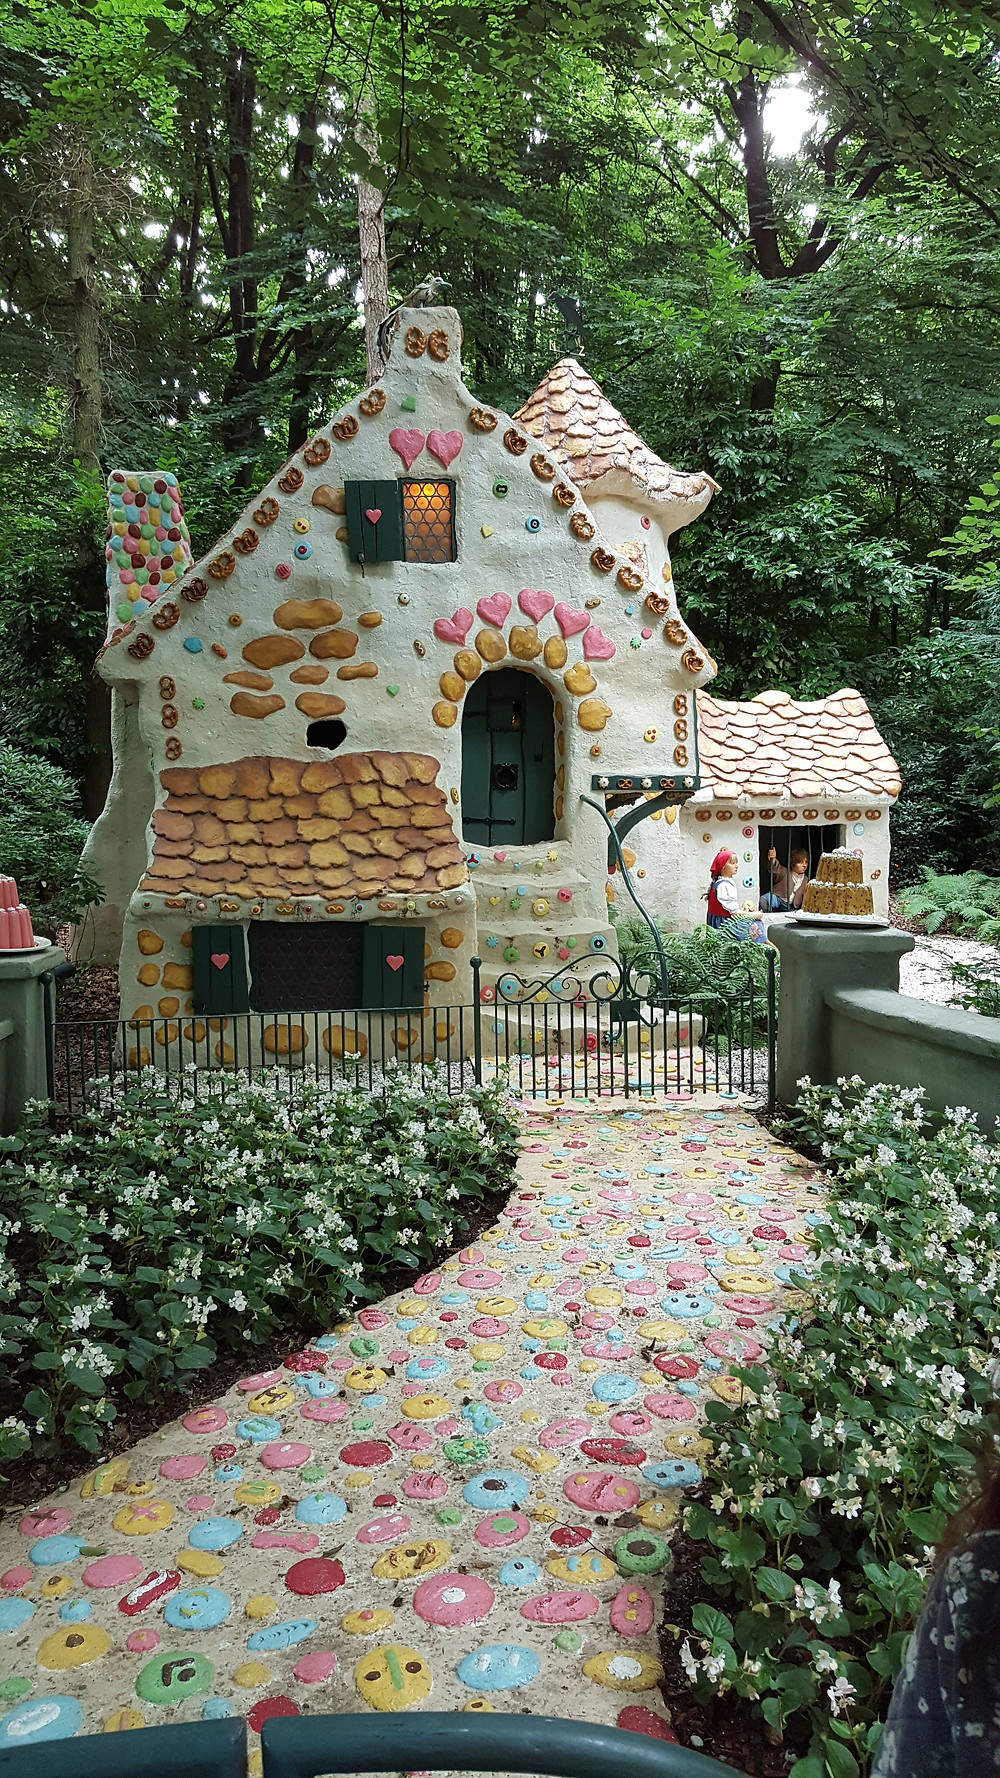 פארק אפטלינג הולנד